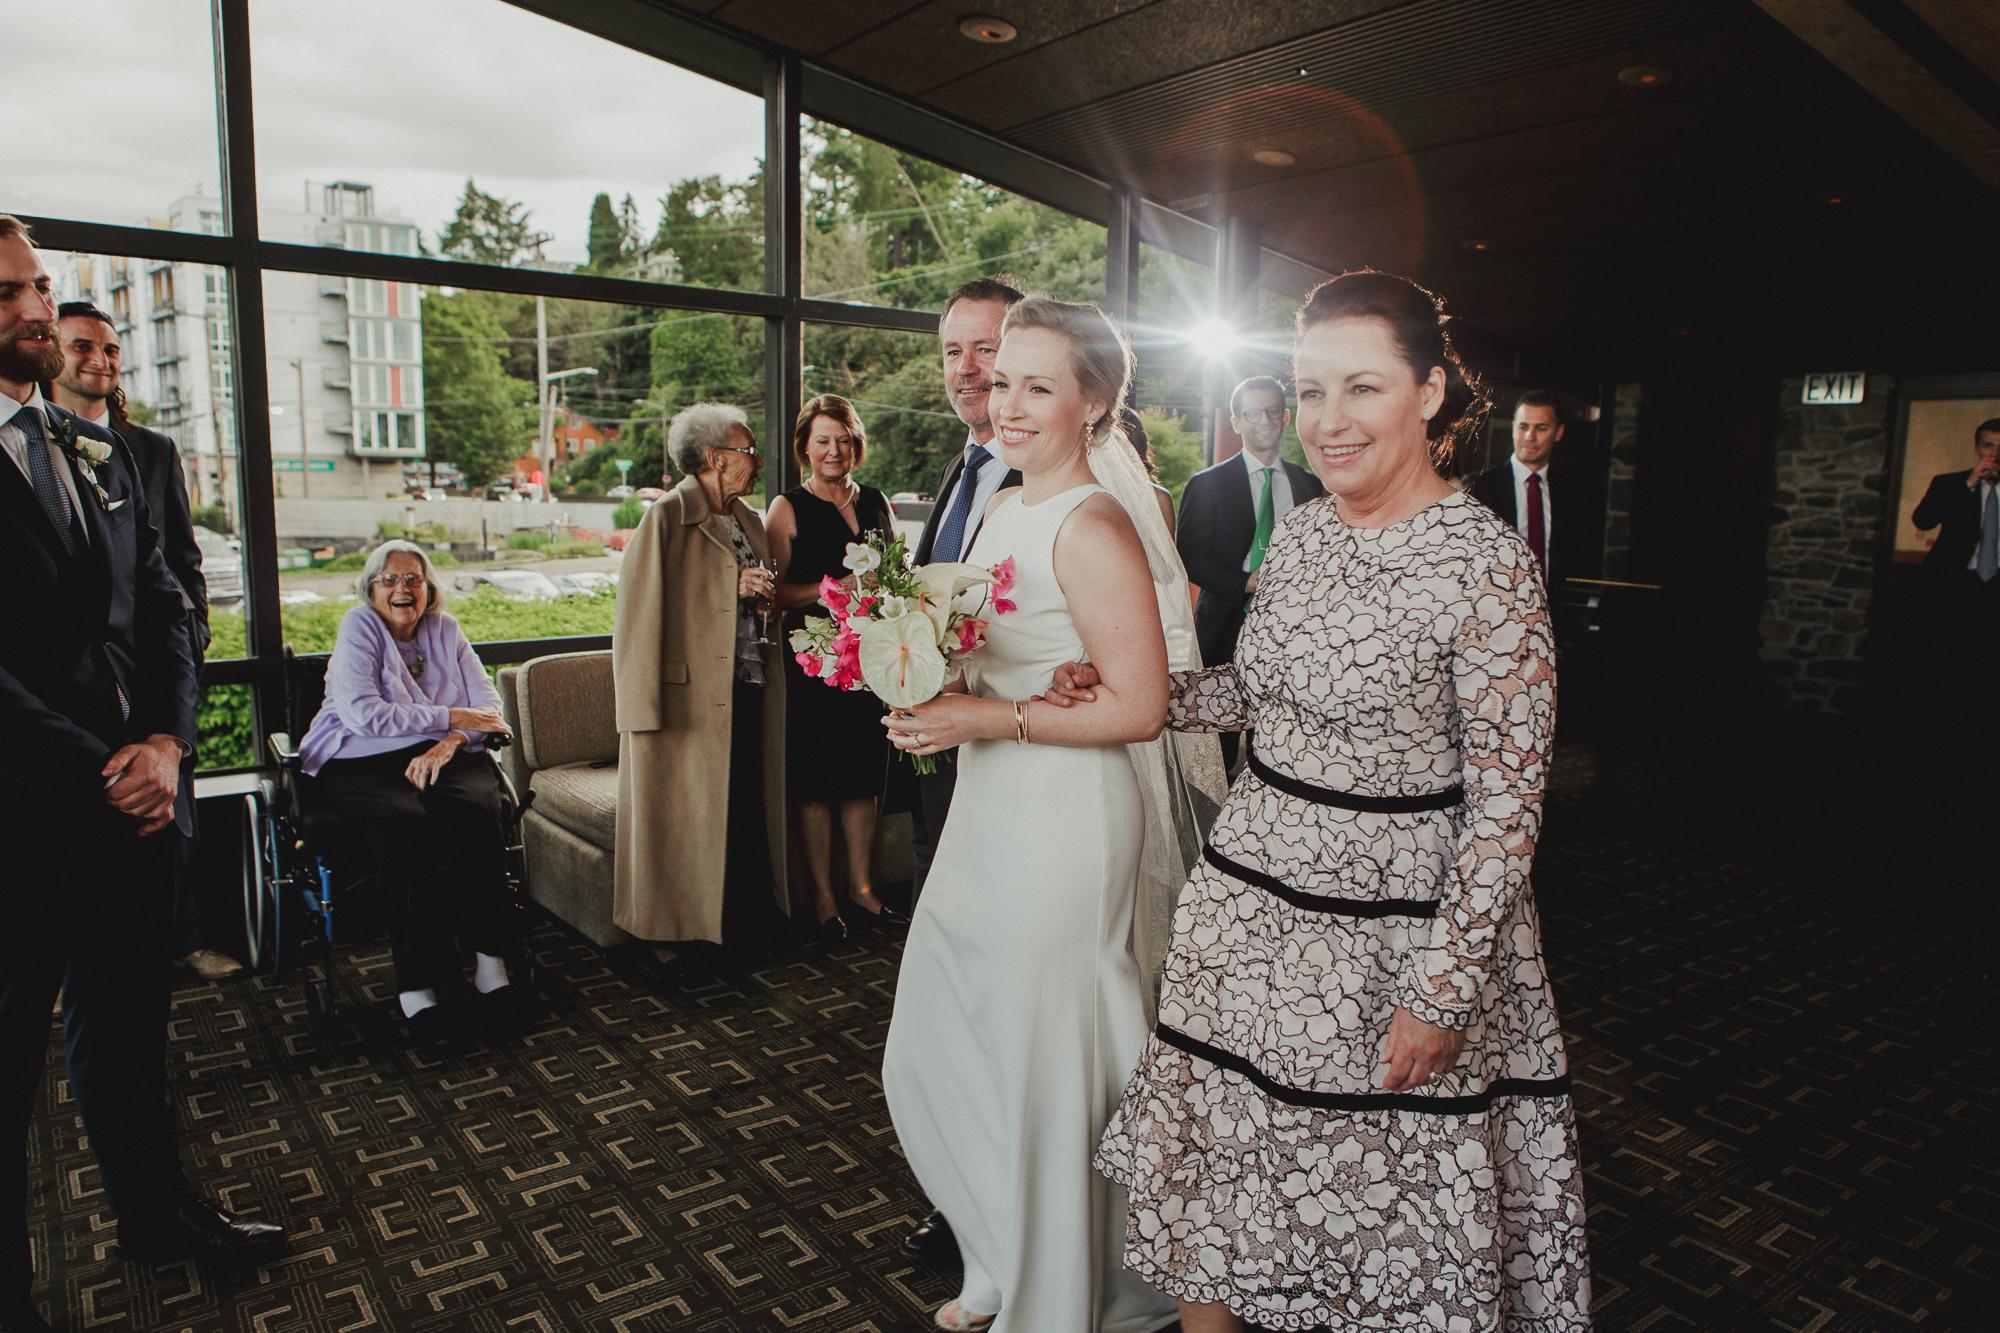 canlis restaurant wedding photos by Krista Welch-0051.jpg